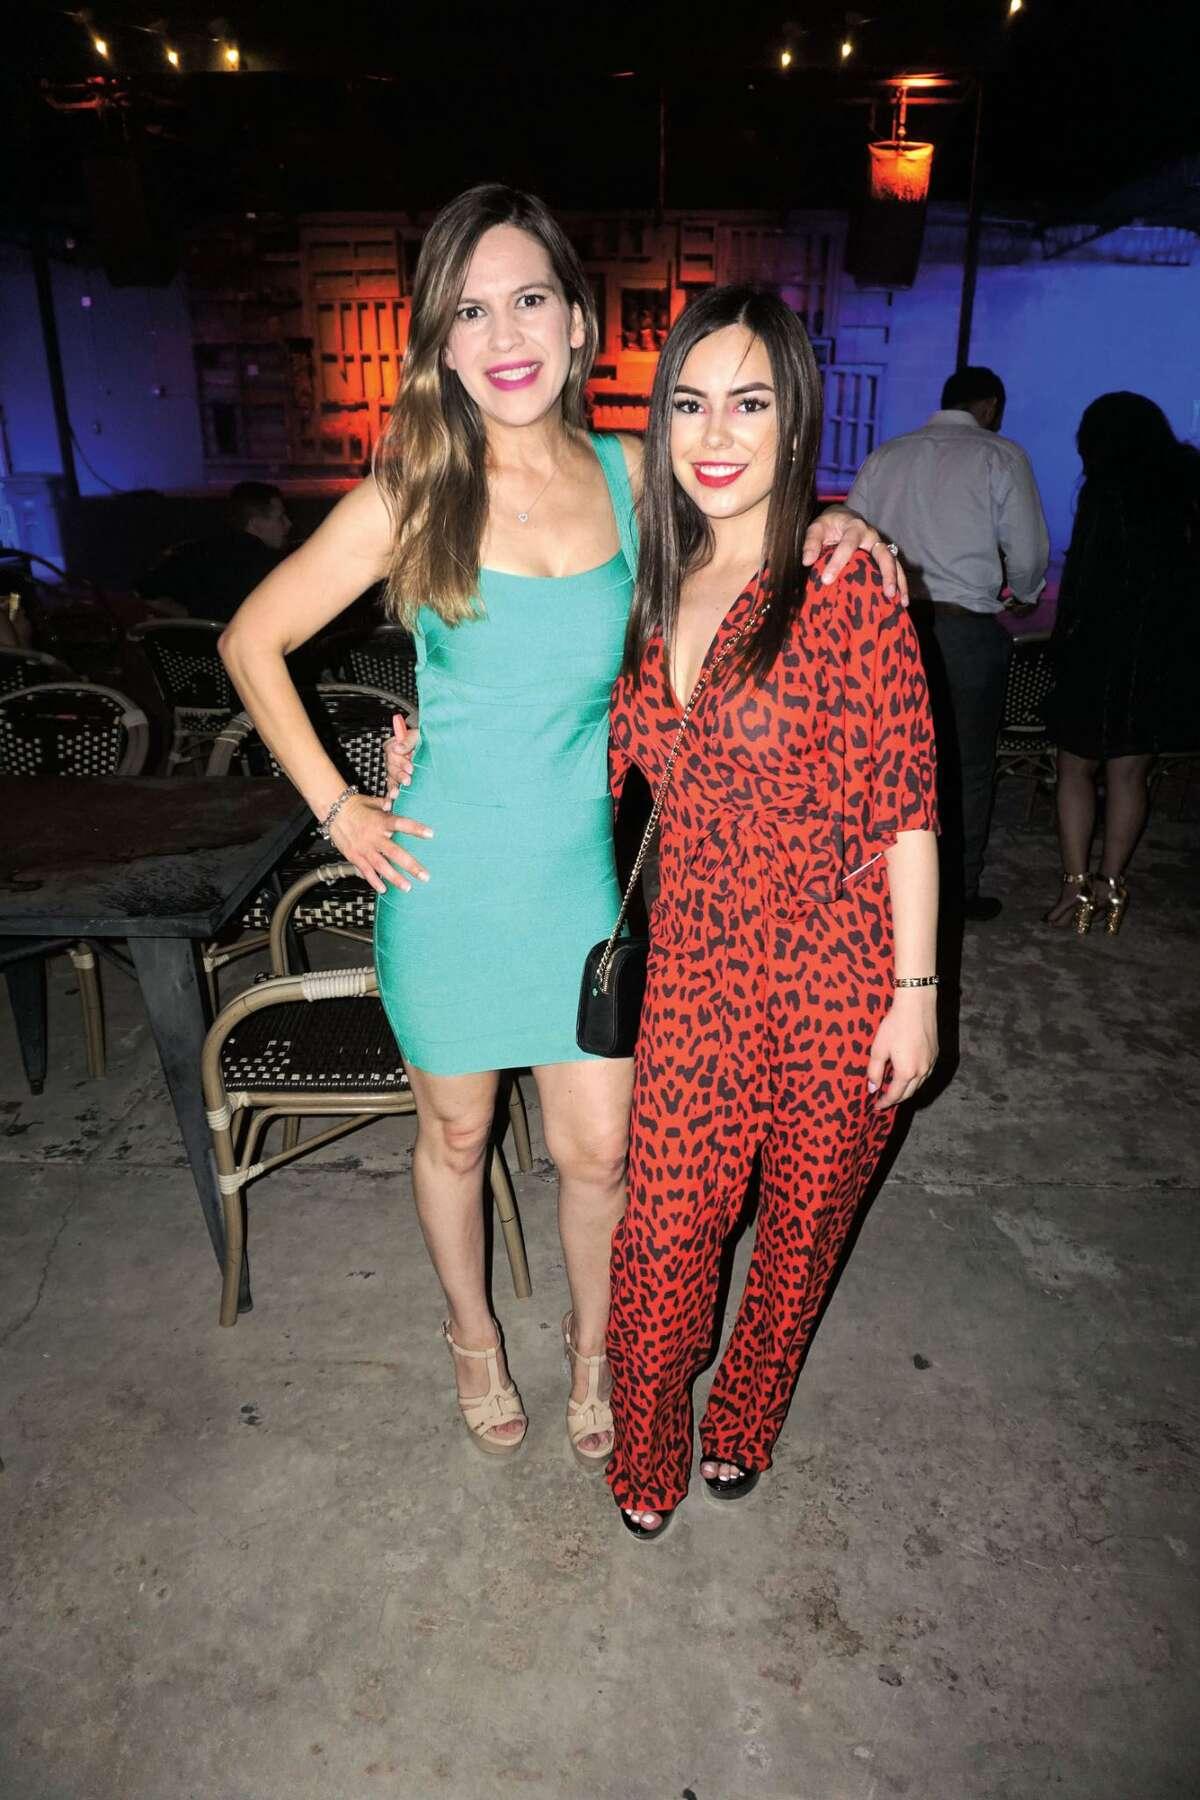 Maritza Garcia and Kristen Davila at Siete Banderas